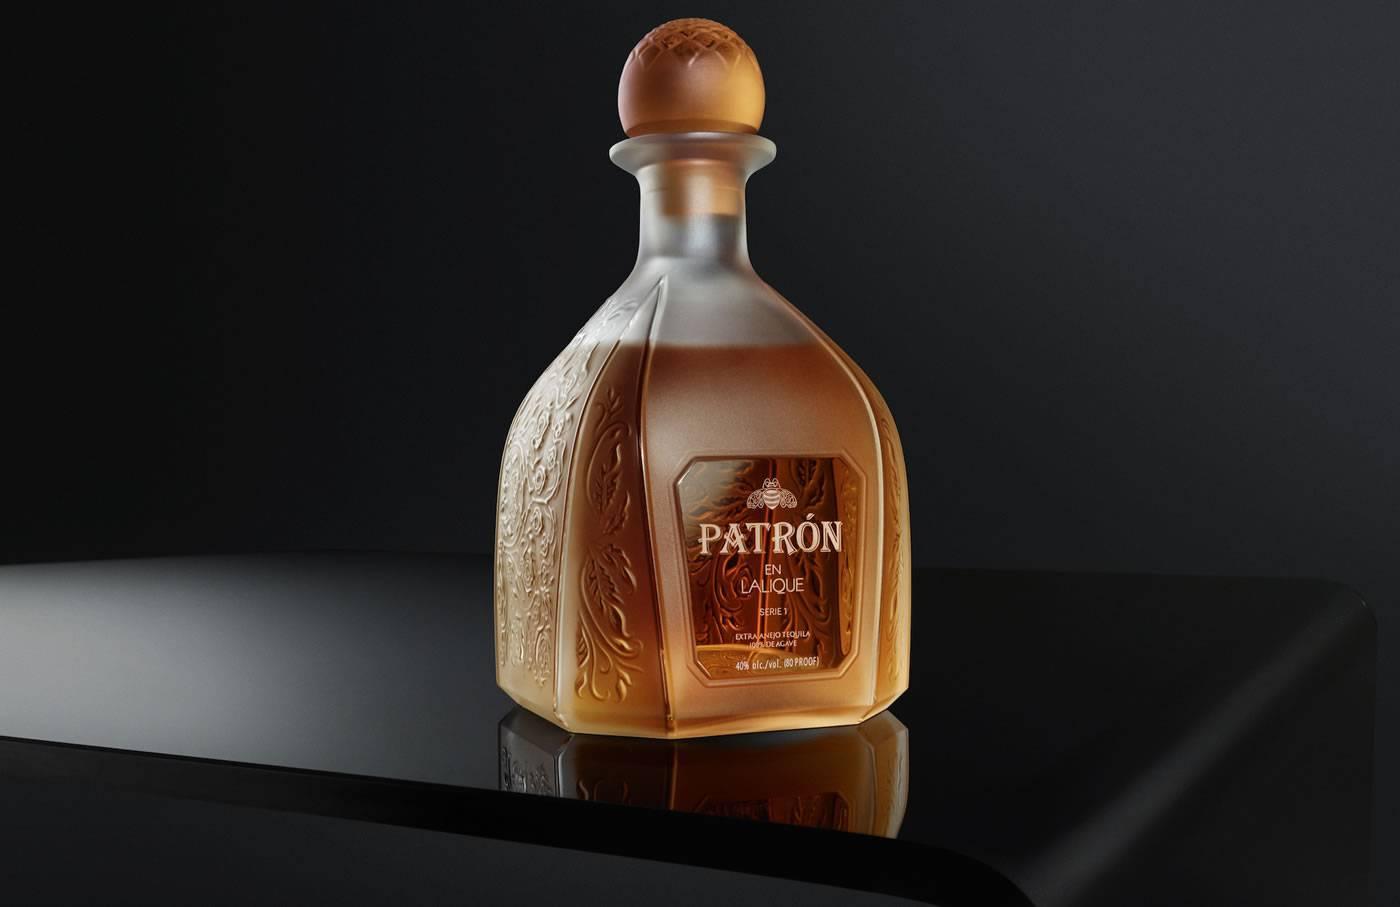 Текила патрон (patron) – особенности, виды, история